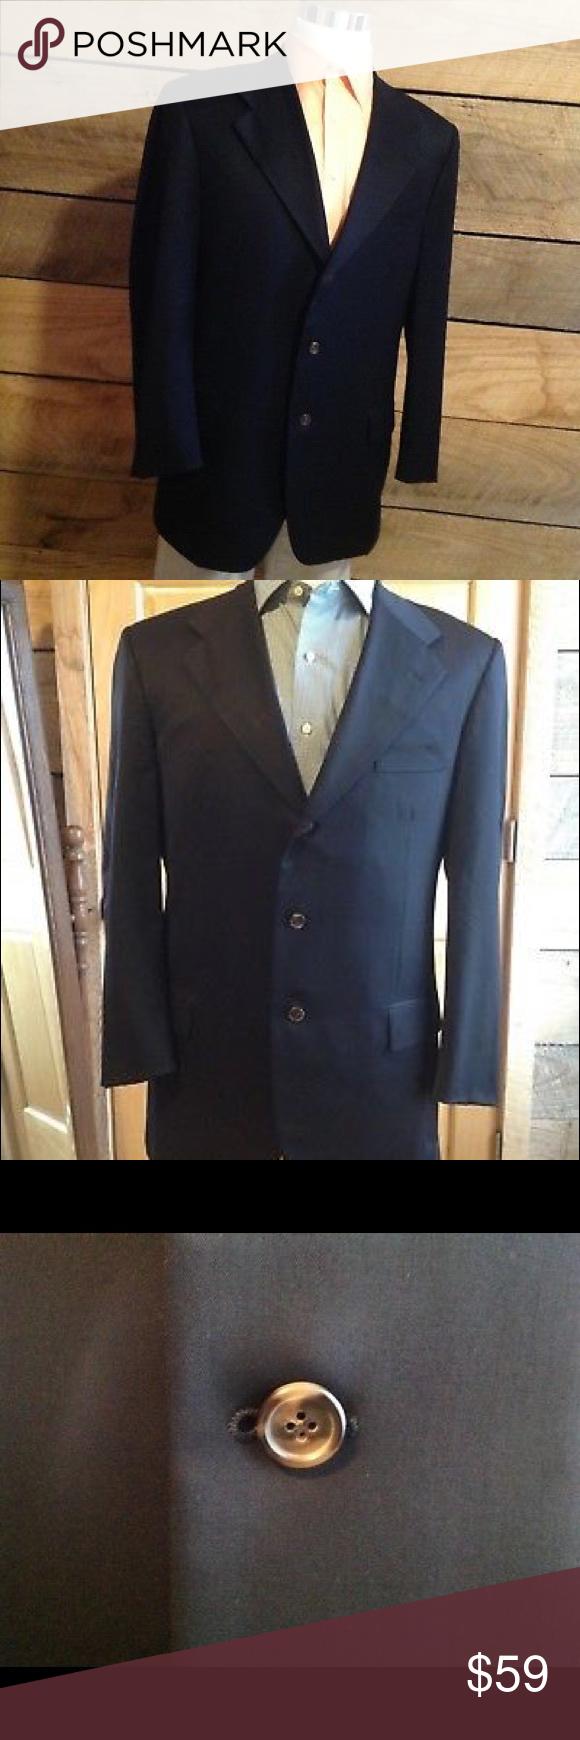 47973c8ef Navy Blue Lightweight Wool Sport Coat Blazer Boss Hugo Boss Baldessarini 3  Button Men Sport Coat